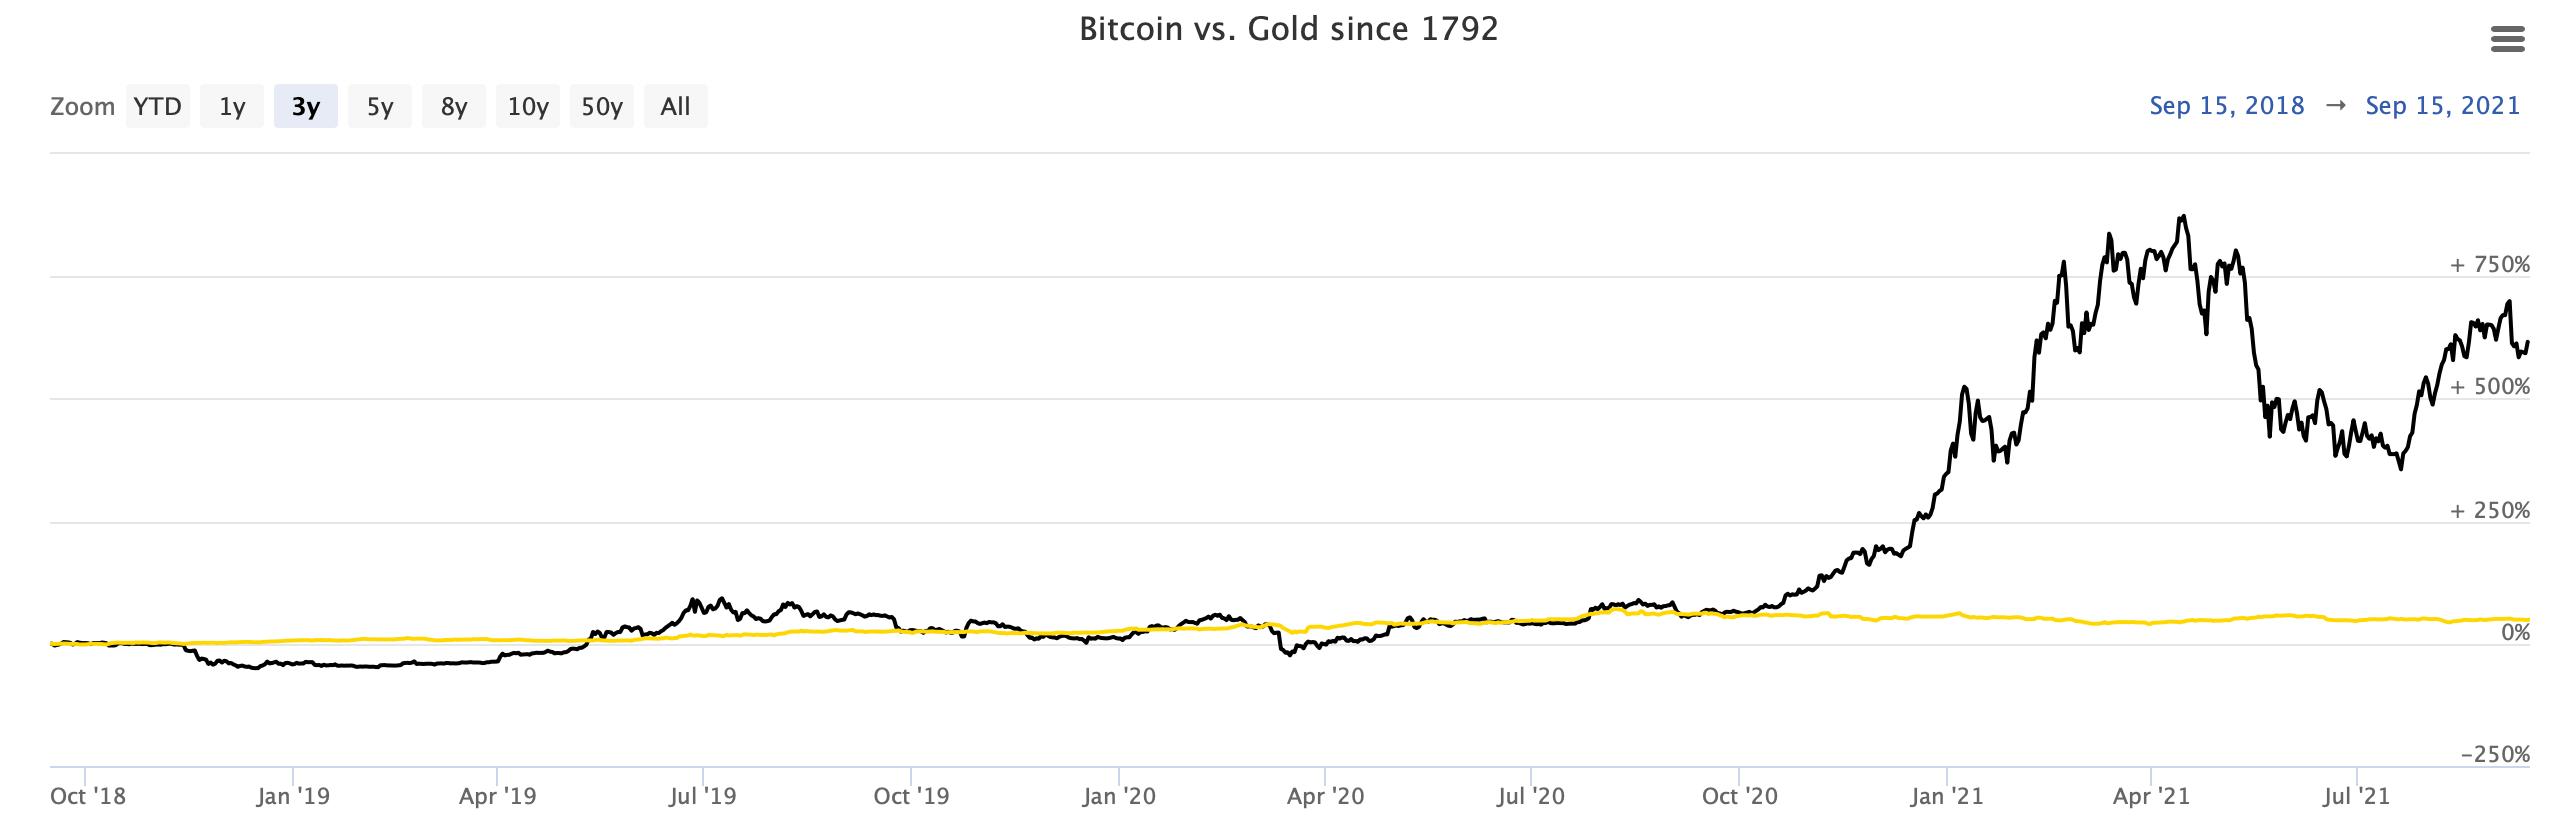 биткоин золото криптовалюта блокчейн